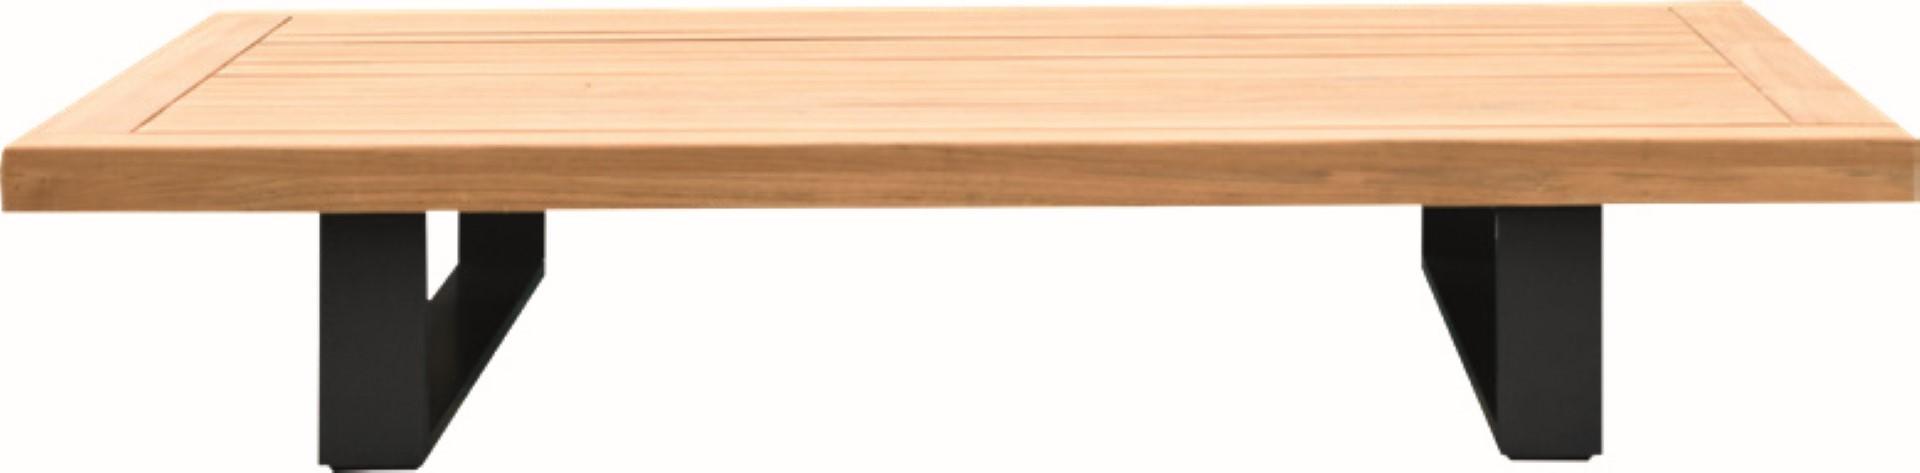 Bora Bora Lounge Platform Coffee Table Teak 105 x 140 cm